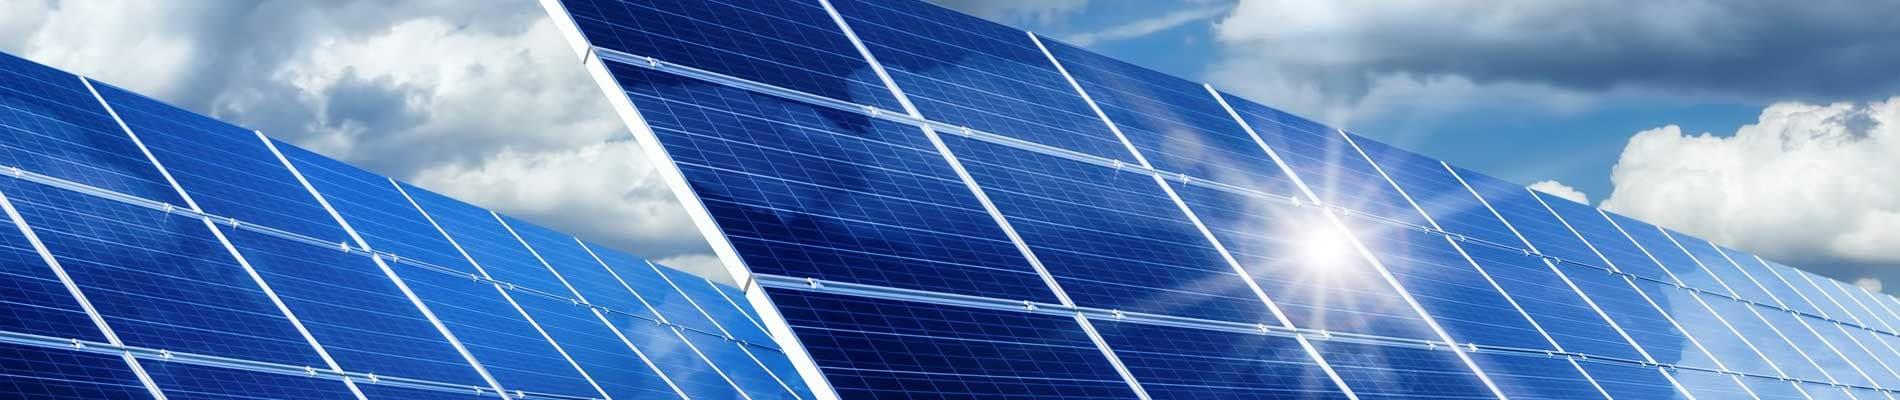 Energies i energies renovables